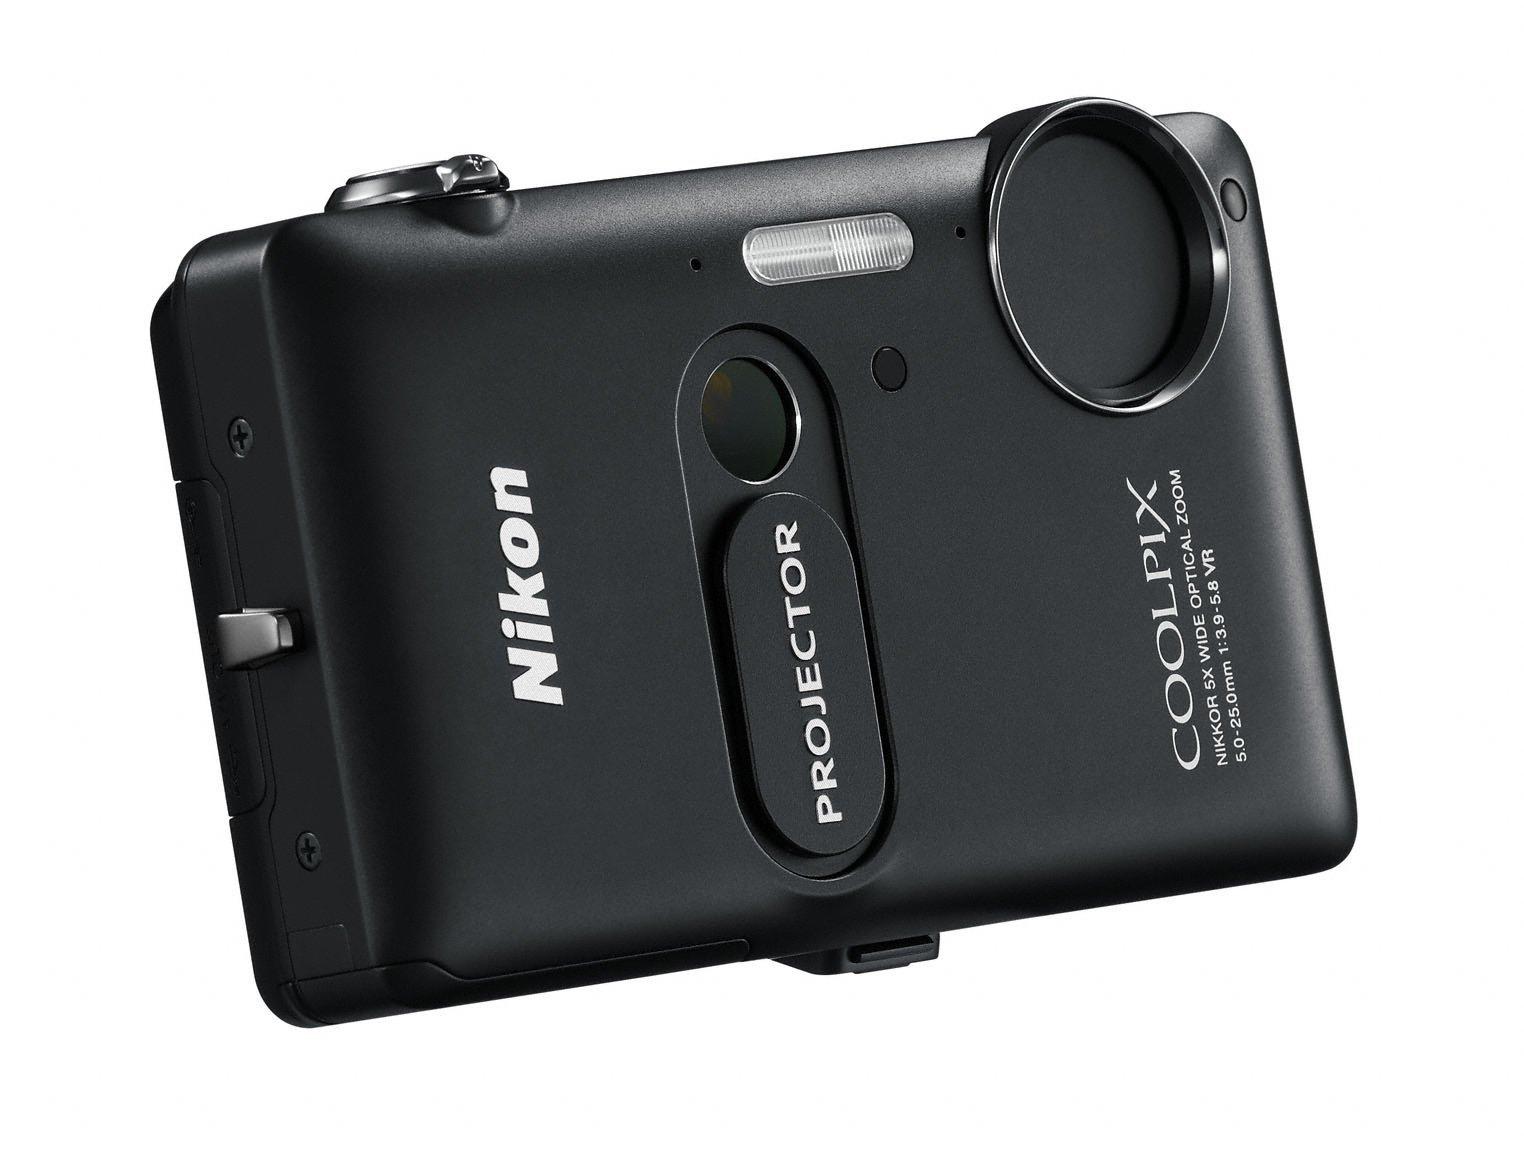 Nikon: Projektor mit iPhone-Anschluss in der Digitalkamera - Nikon Coolpix S1200pj (Bild: Nikon)